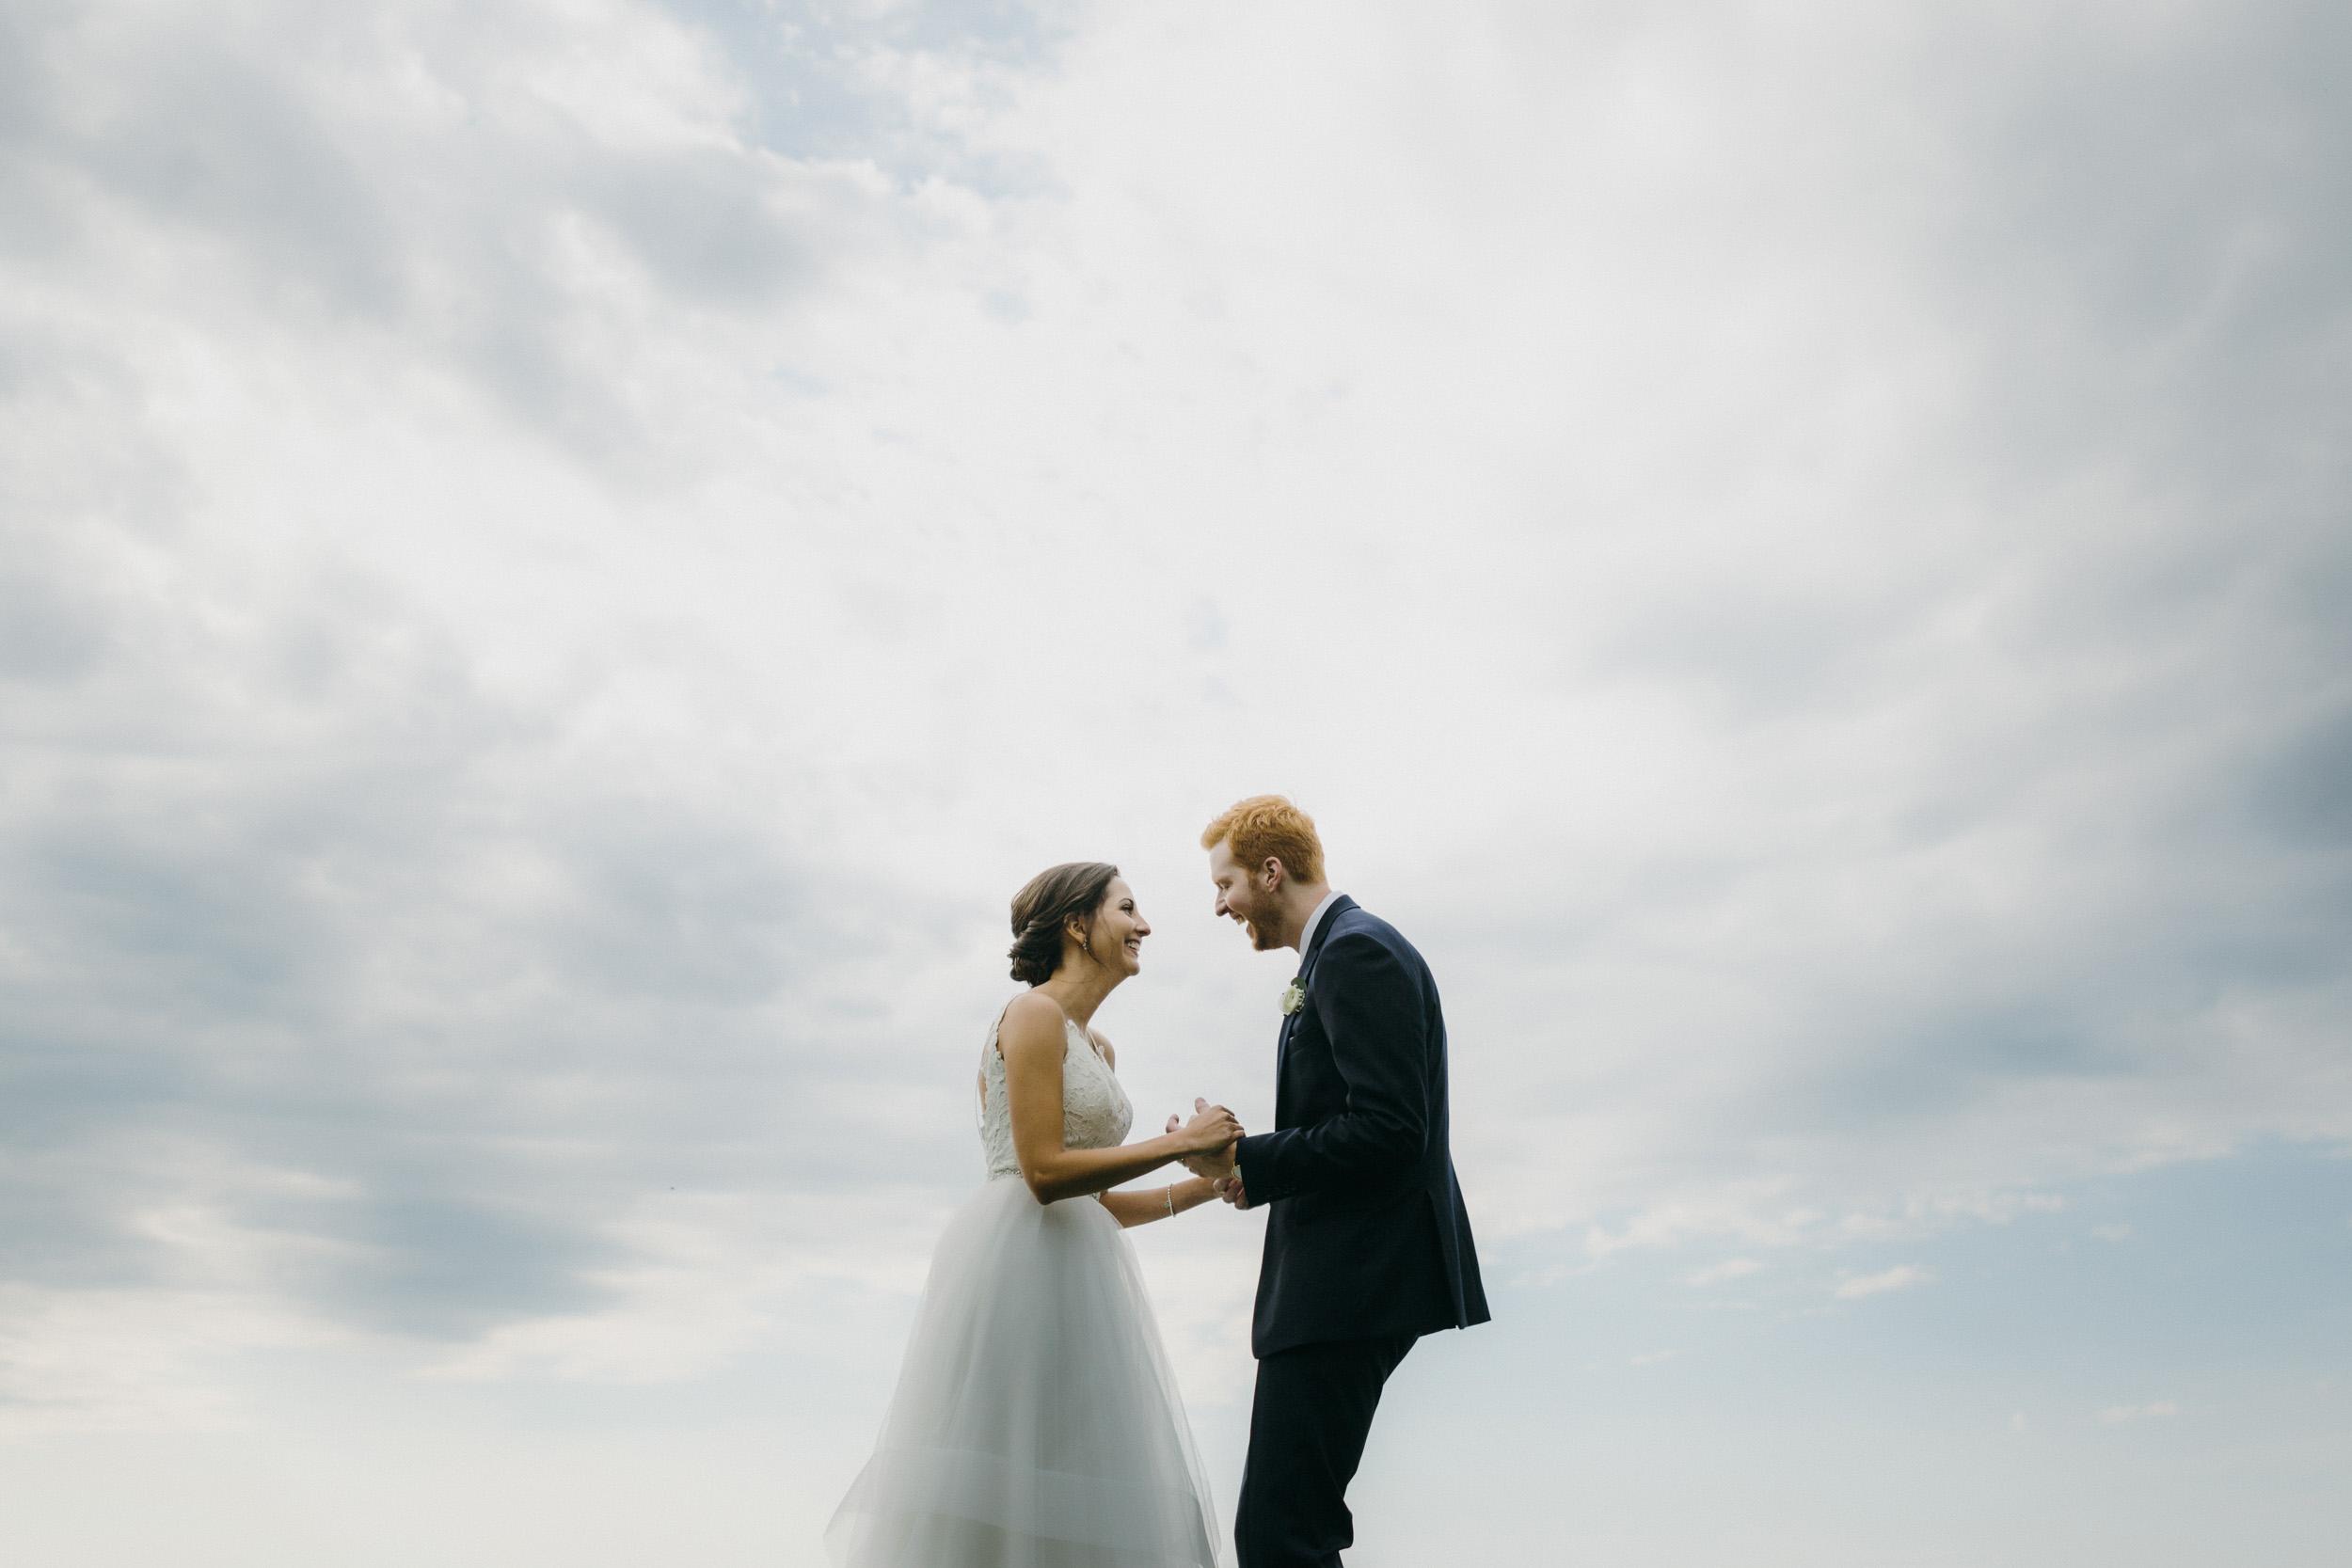 50-minneapolis outdoor creative wedding photographers-1.jpg